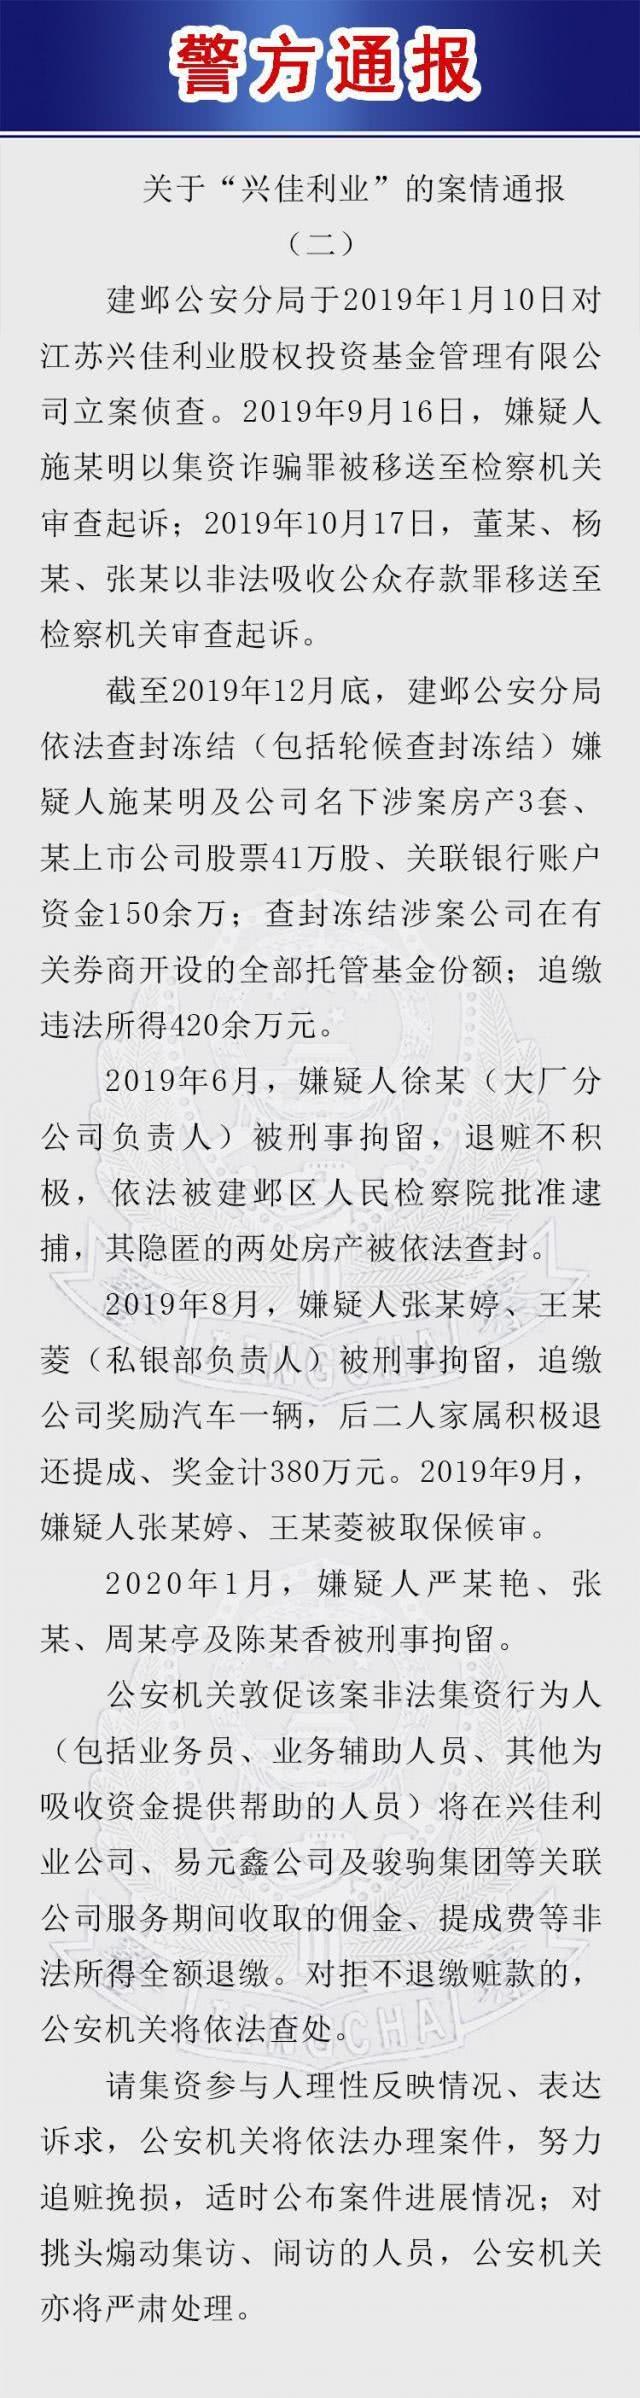 "<b>南京警方通报""兴佳利业""非法吸收公众存款案进展,4人被刑拘</b>"